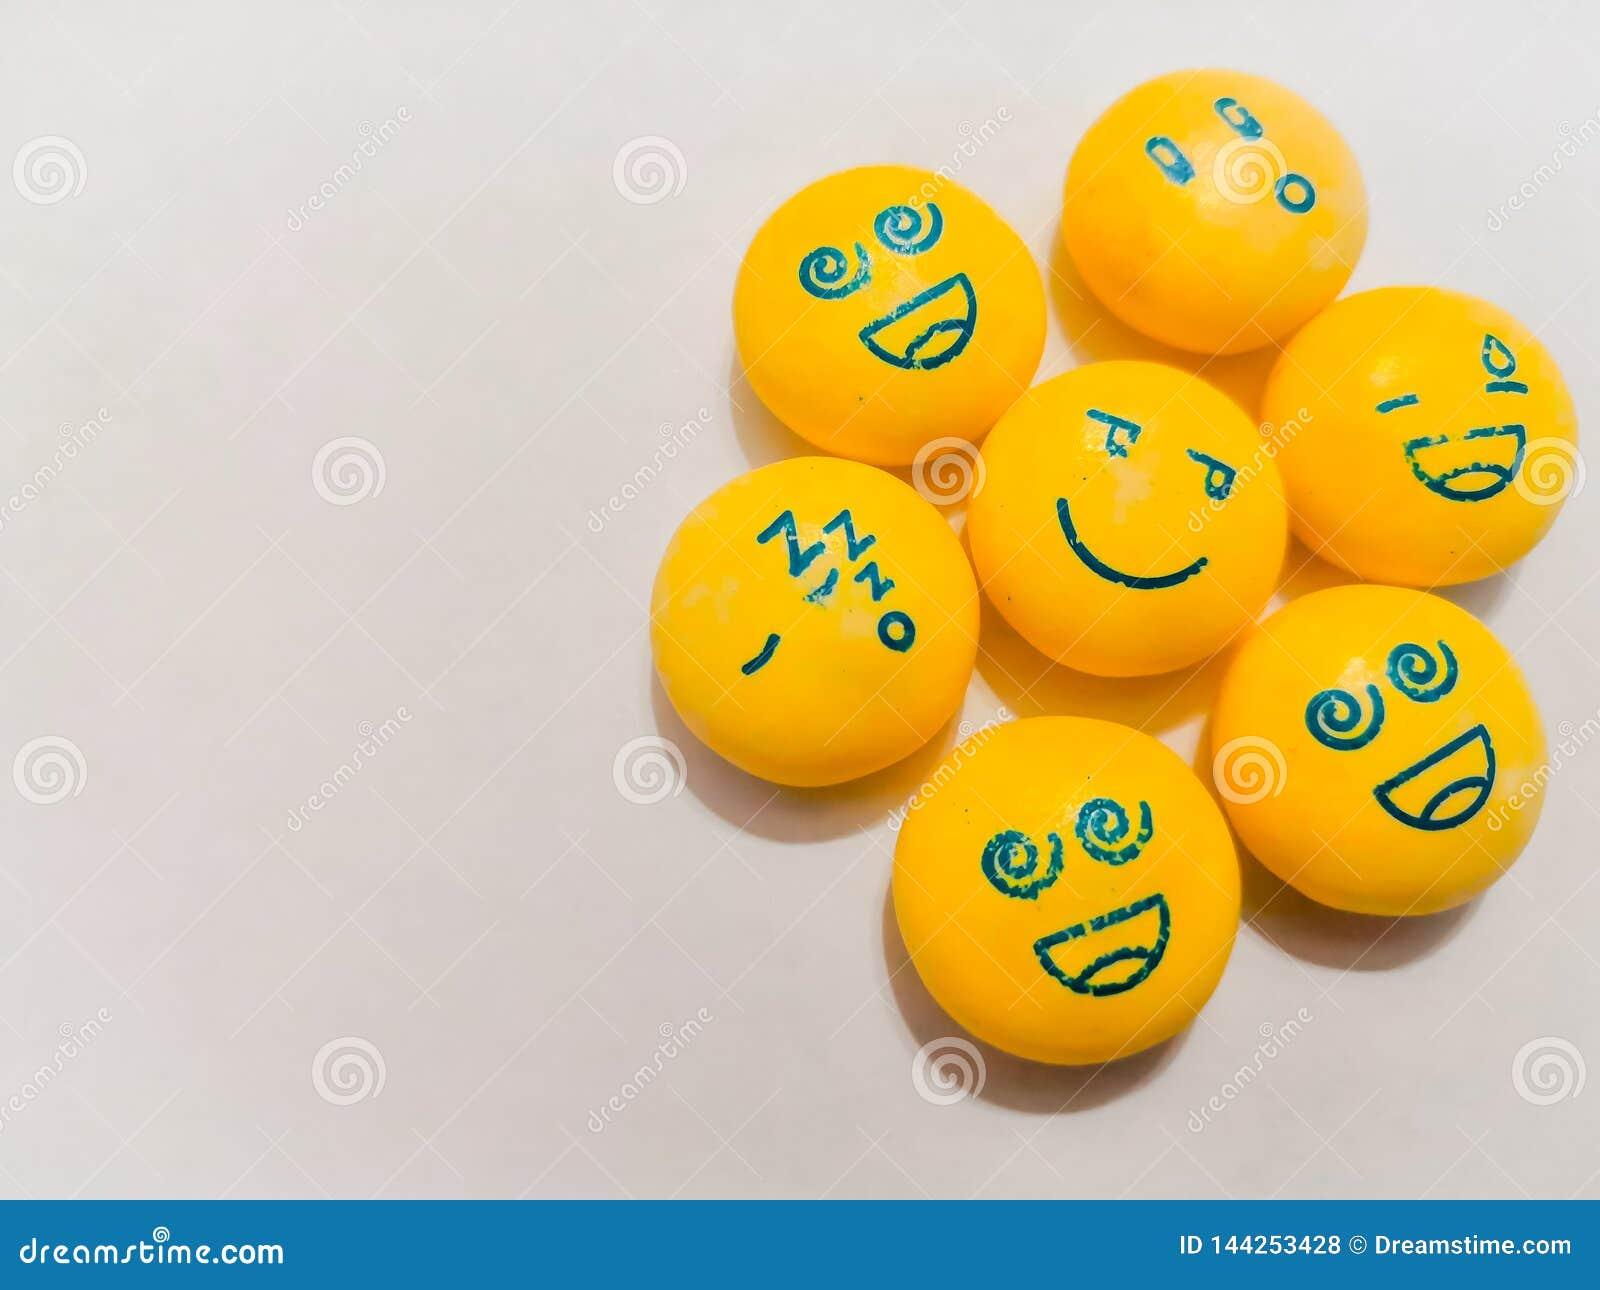 Slapend, droevige, gelukkige glimlachen, emoties